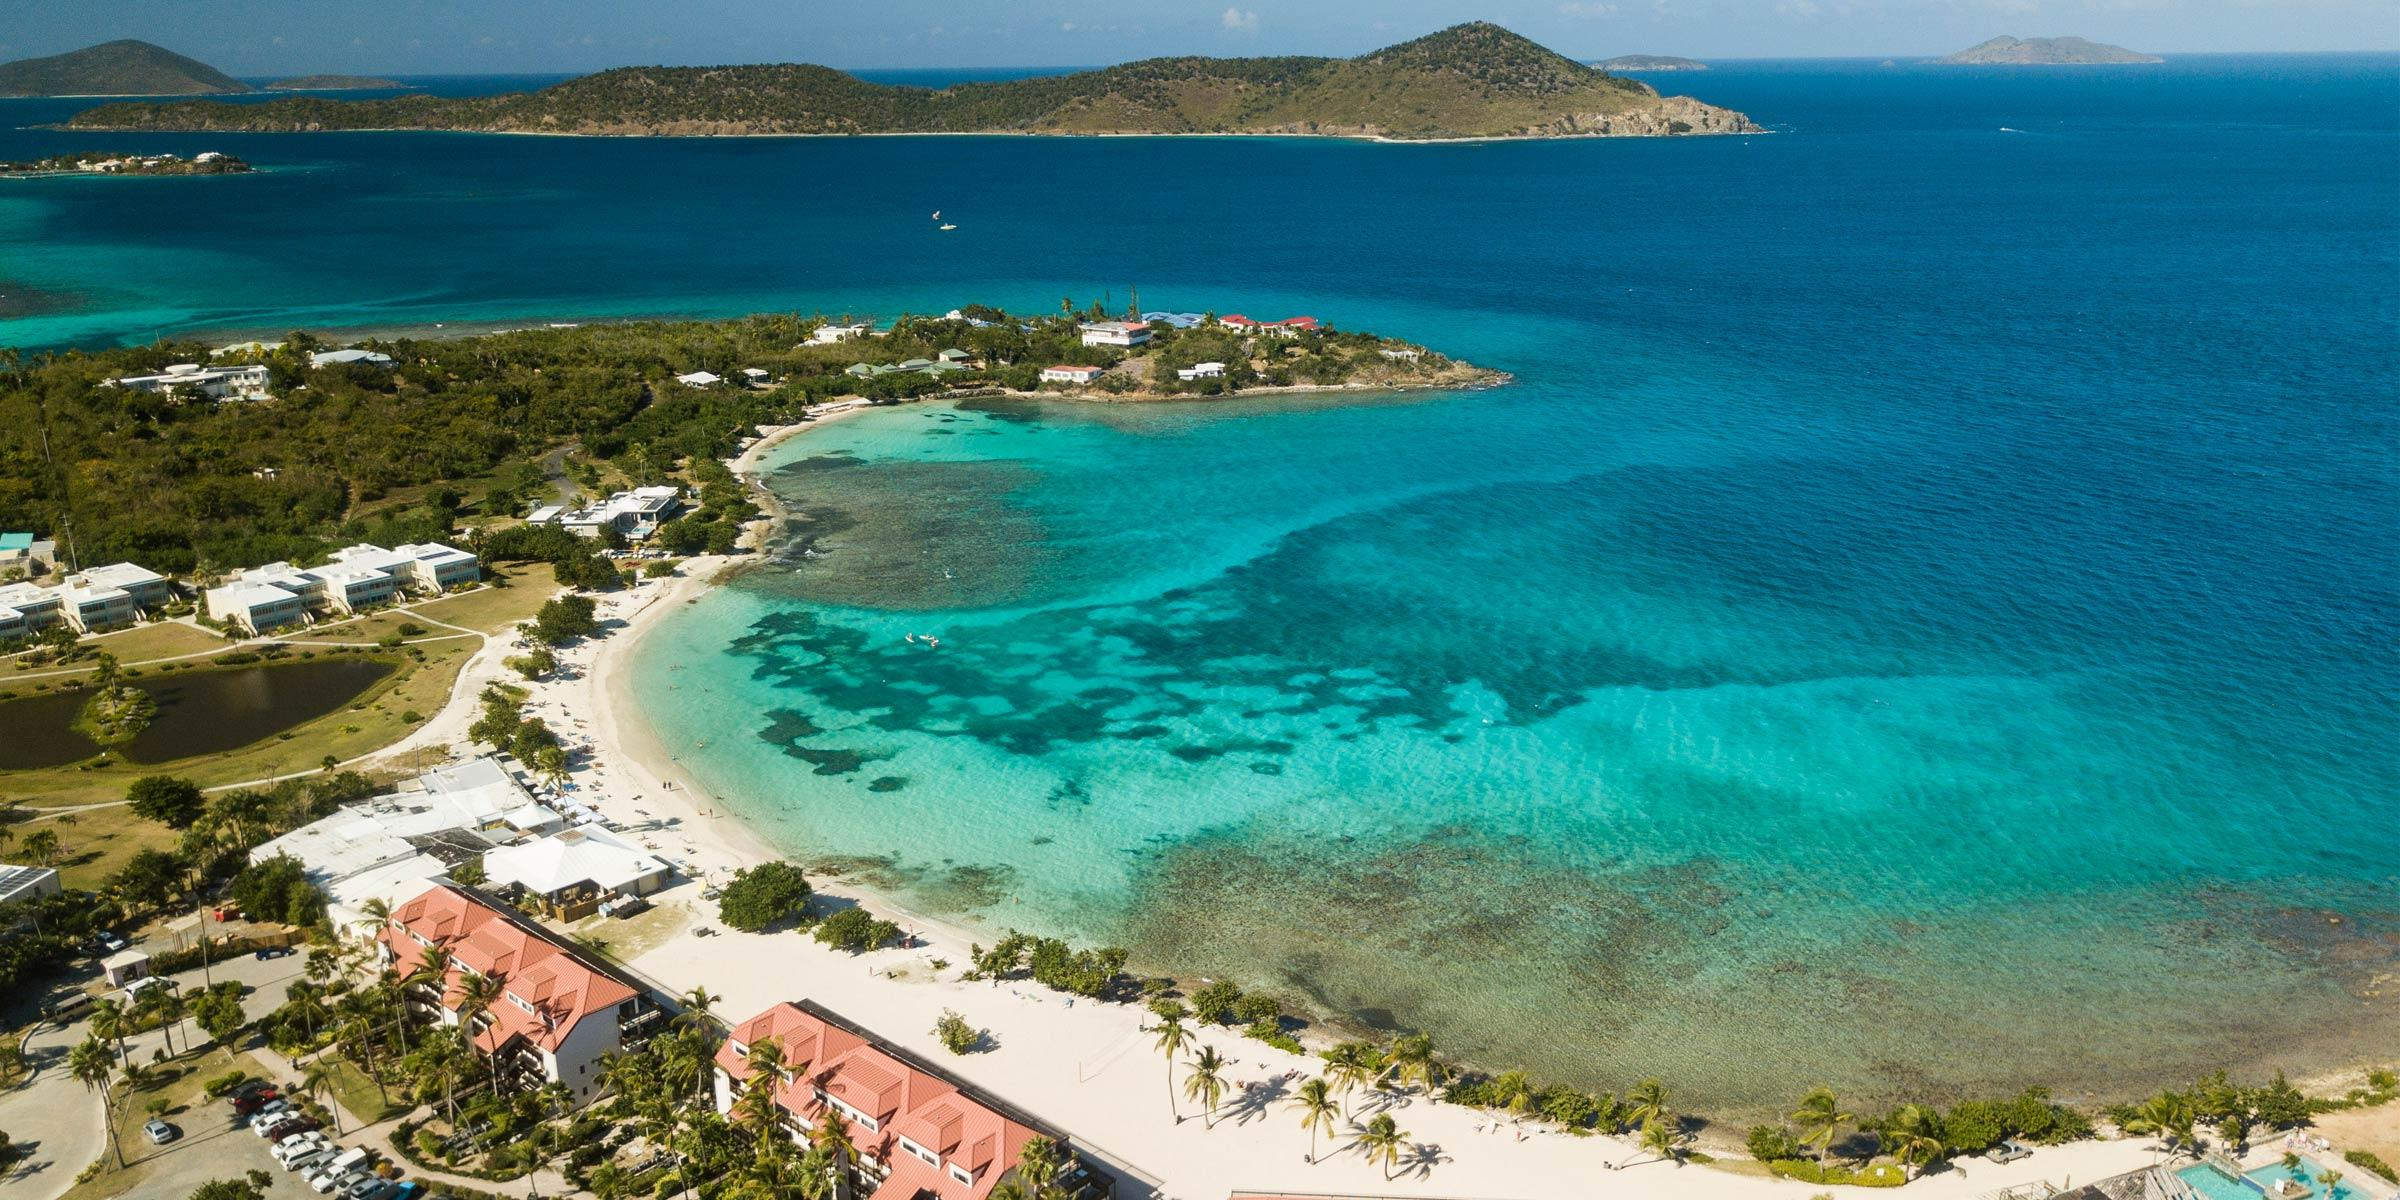 Sapphire Beach on St. Thomas, U.S. Virgin Islands